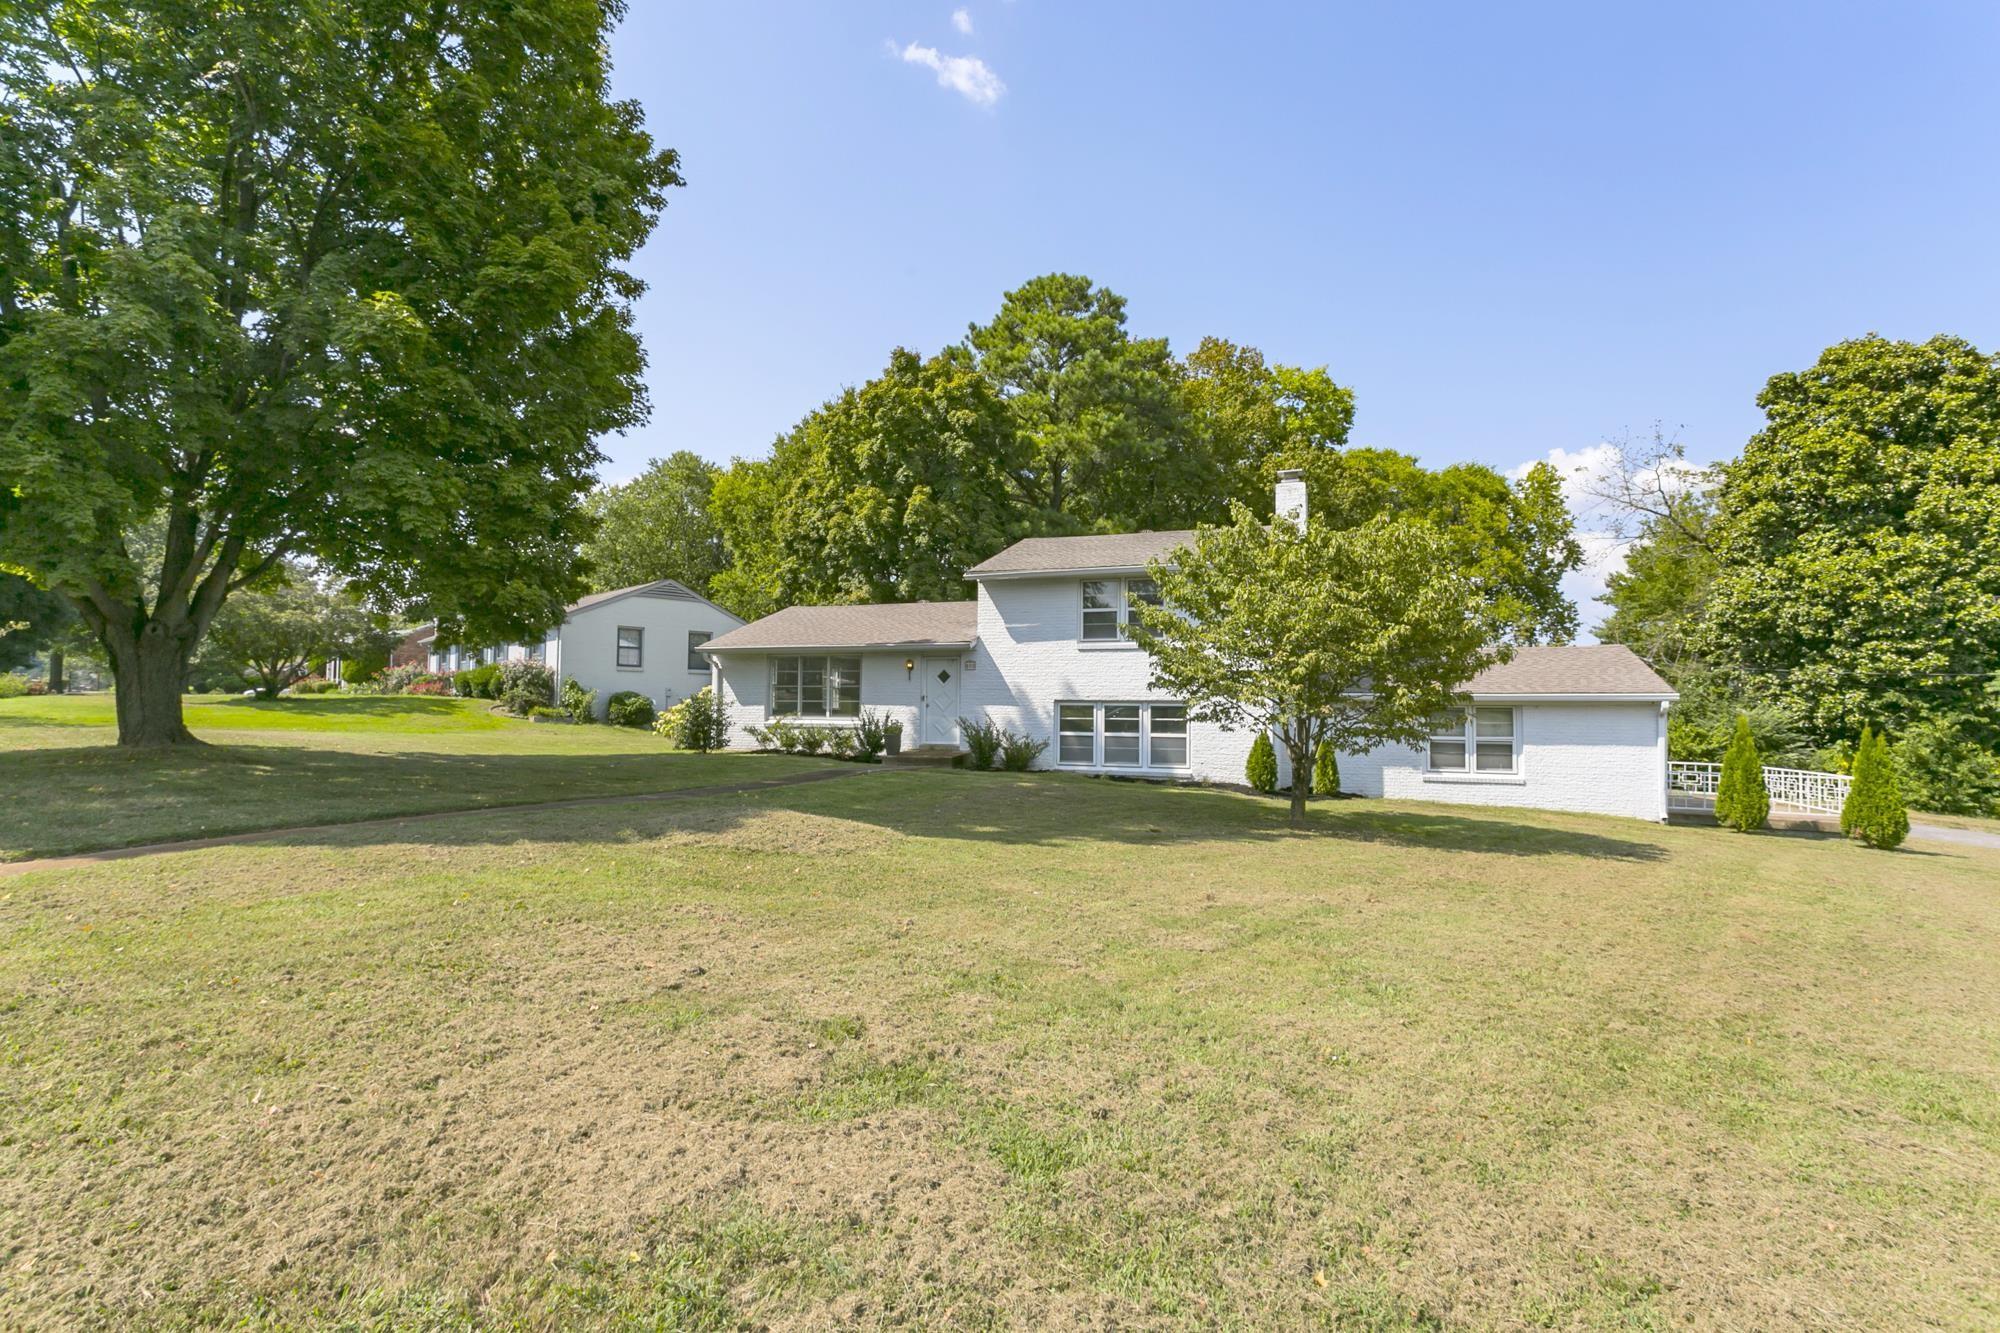 600 Harding Pl, Nashville, TN 37211 - Nashville, TN real estate listing